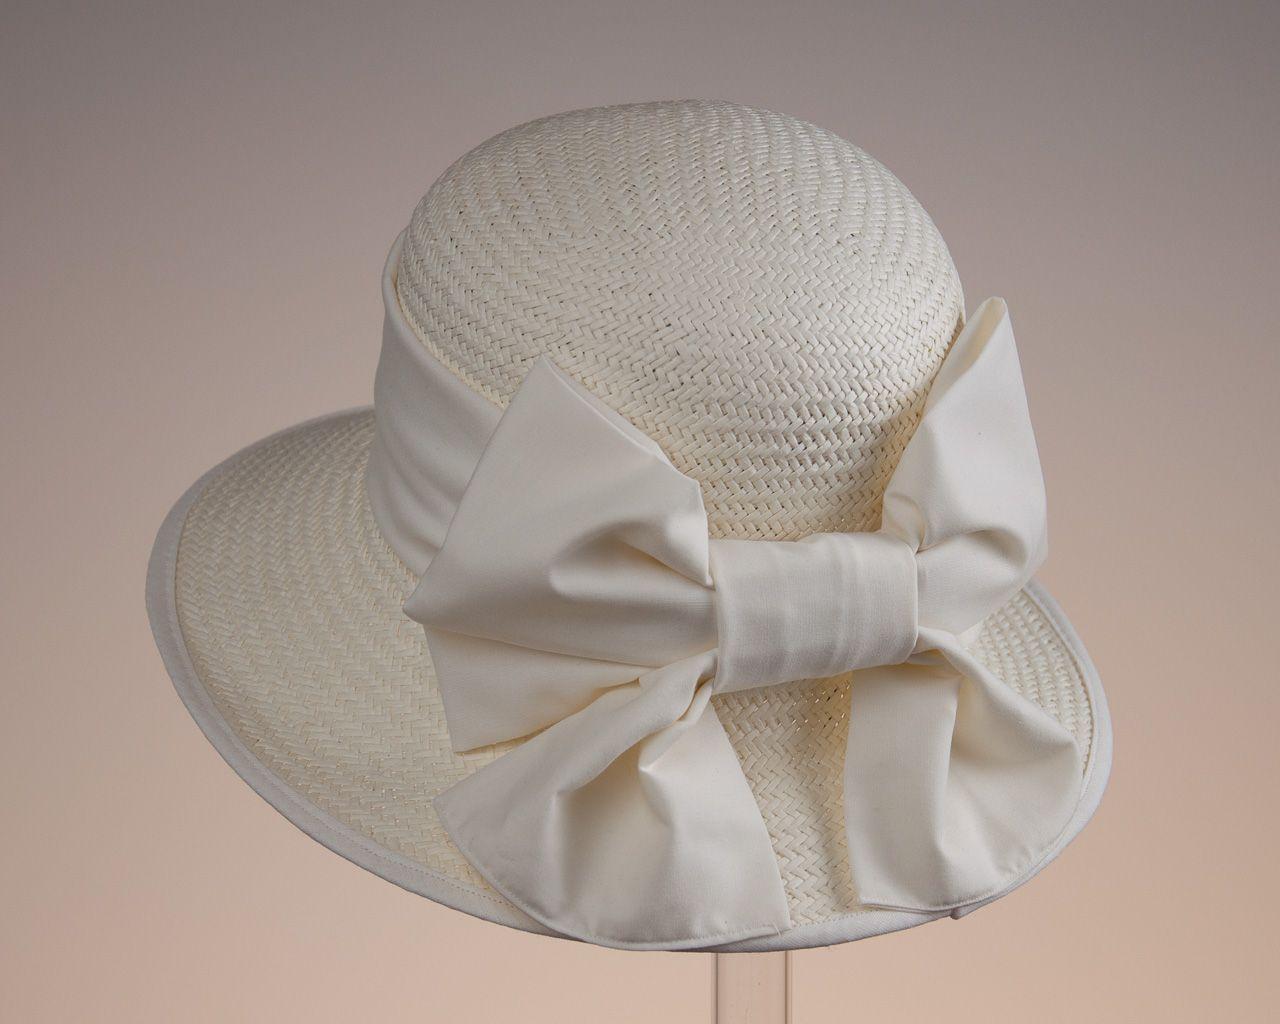 Kopfschmuck & Fascinators Damen Mini Hut Fascinator Burlesque Mode Kleidung & Accessoires